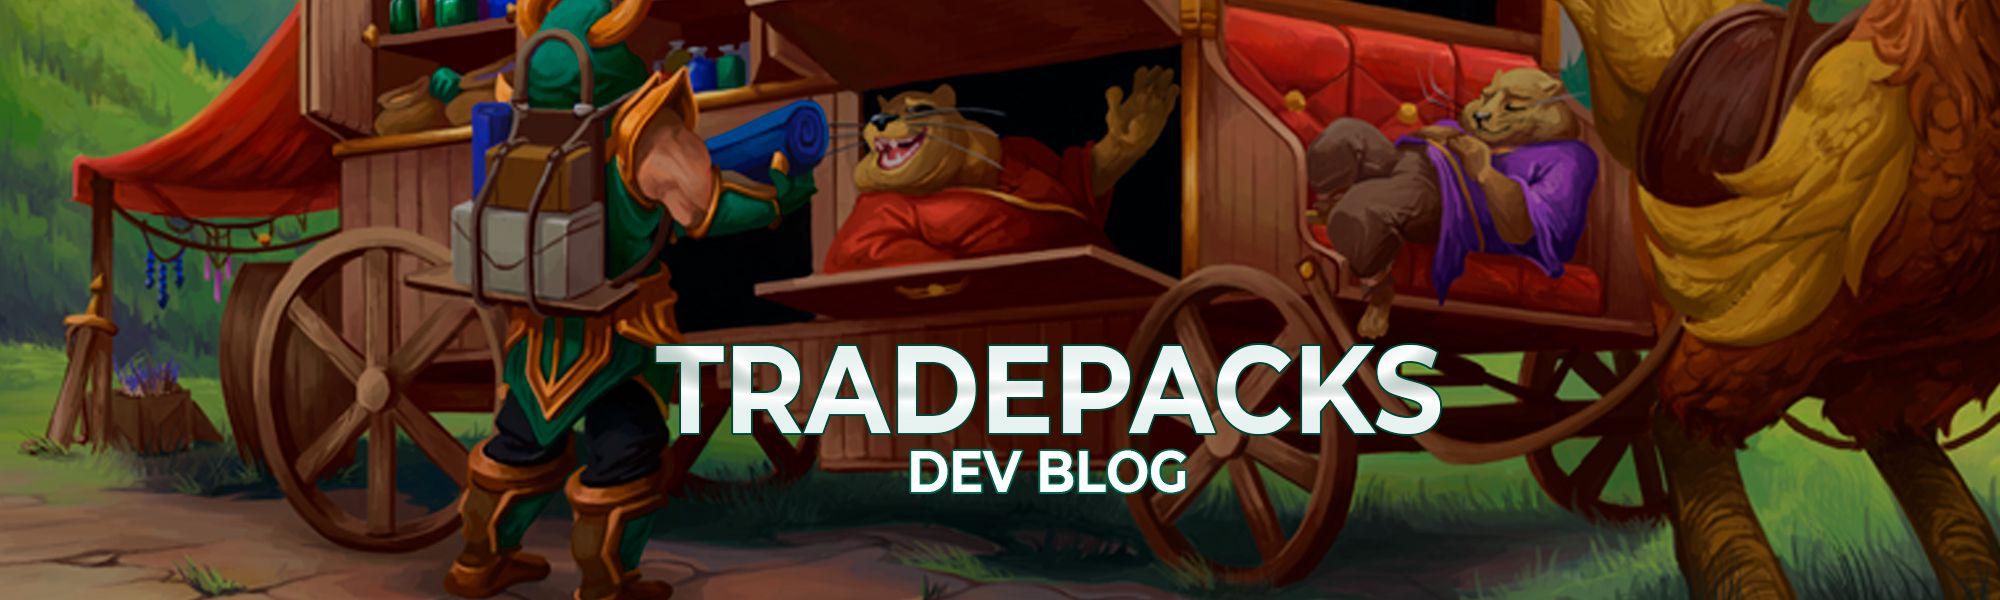 A developer blog on Tradepacks